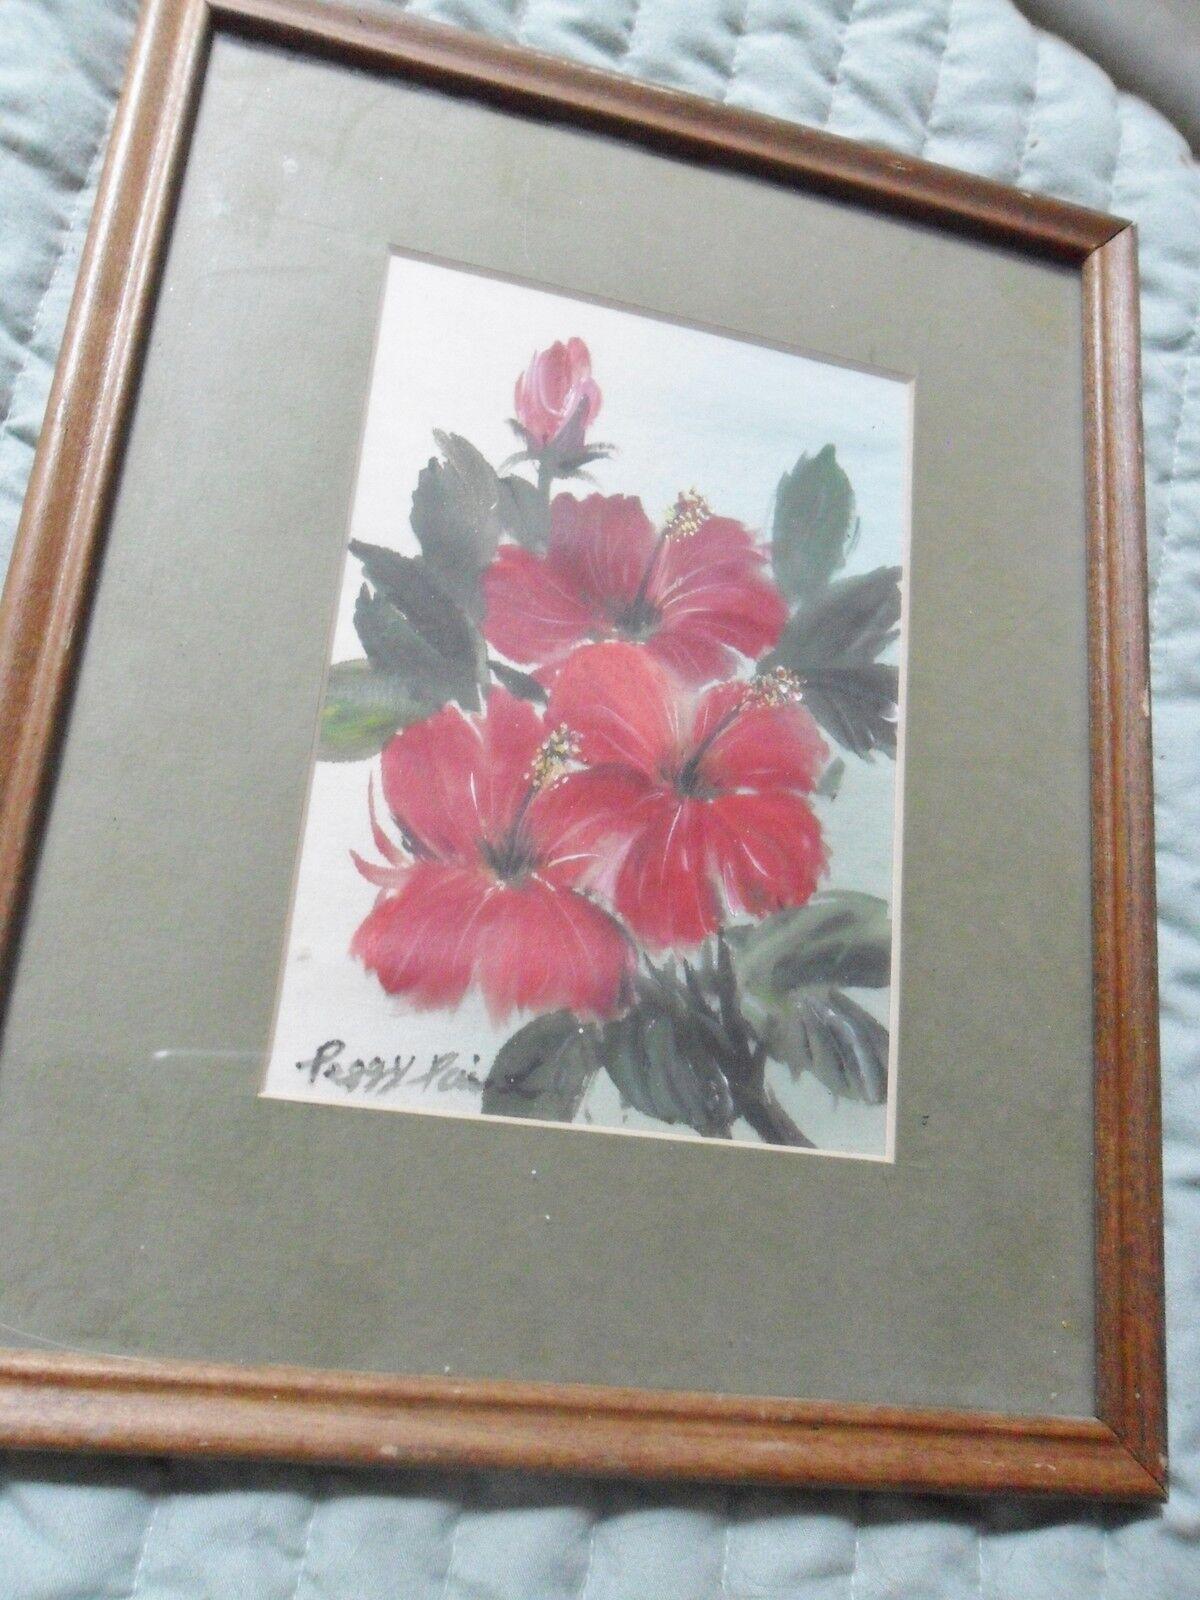 Peggy pai original oil on board hibiscus hawaii state flower peggy pai original oil on board hibiscus hawaii state flower dedicated izmirmasajfo